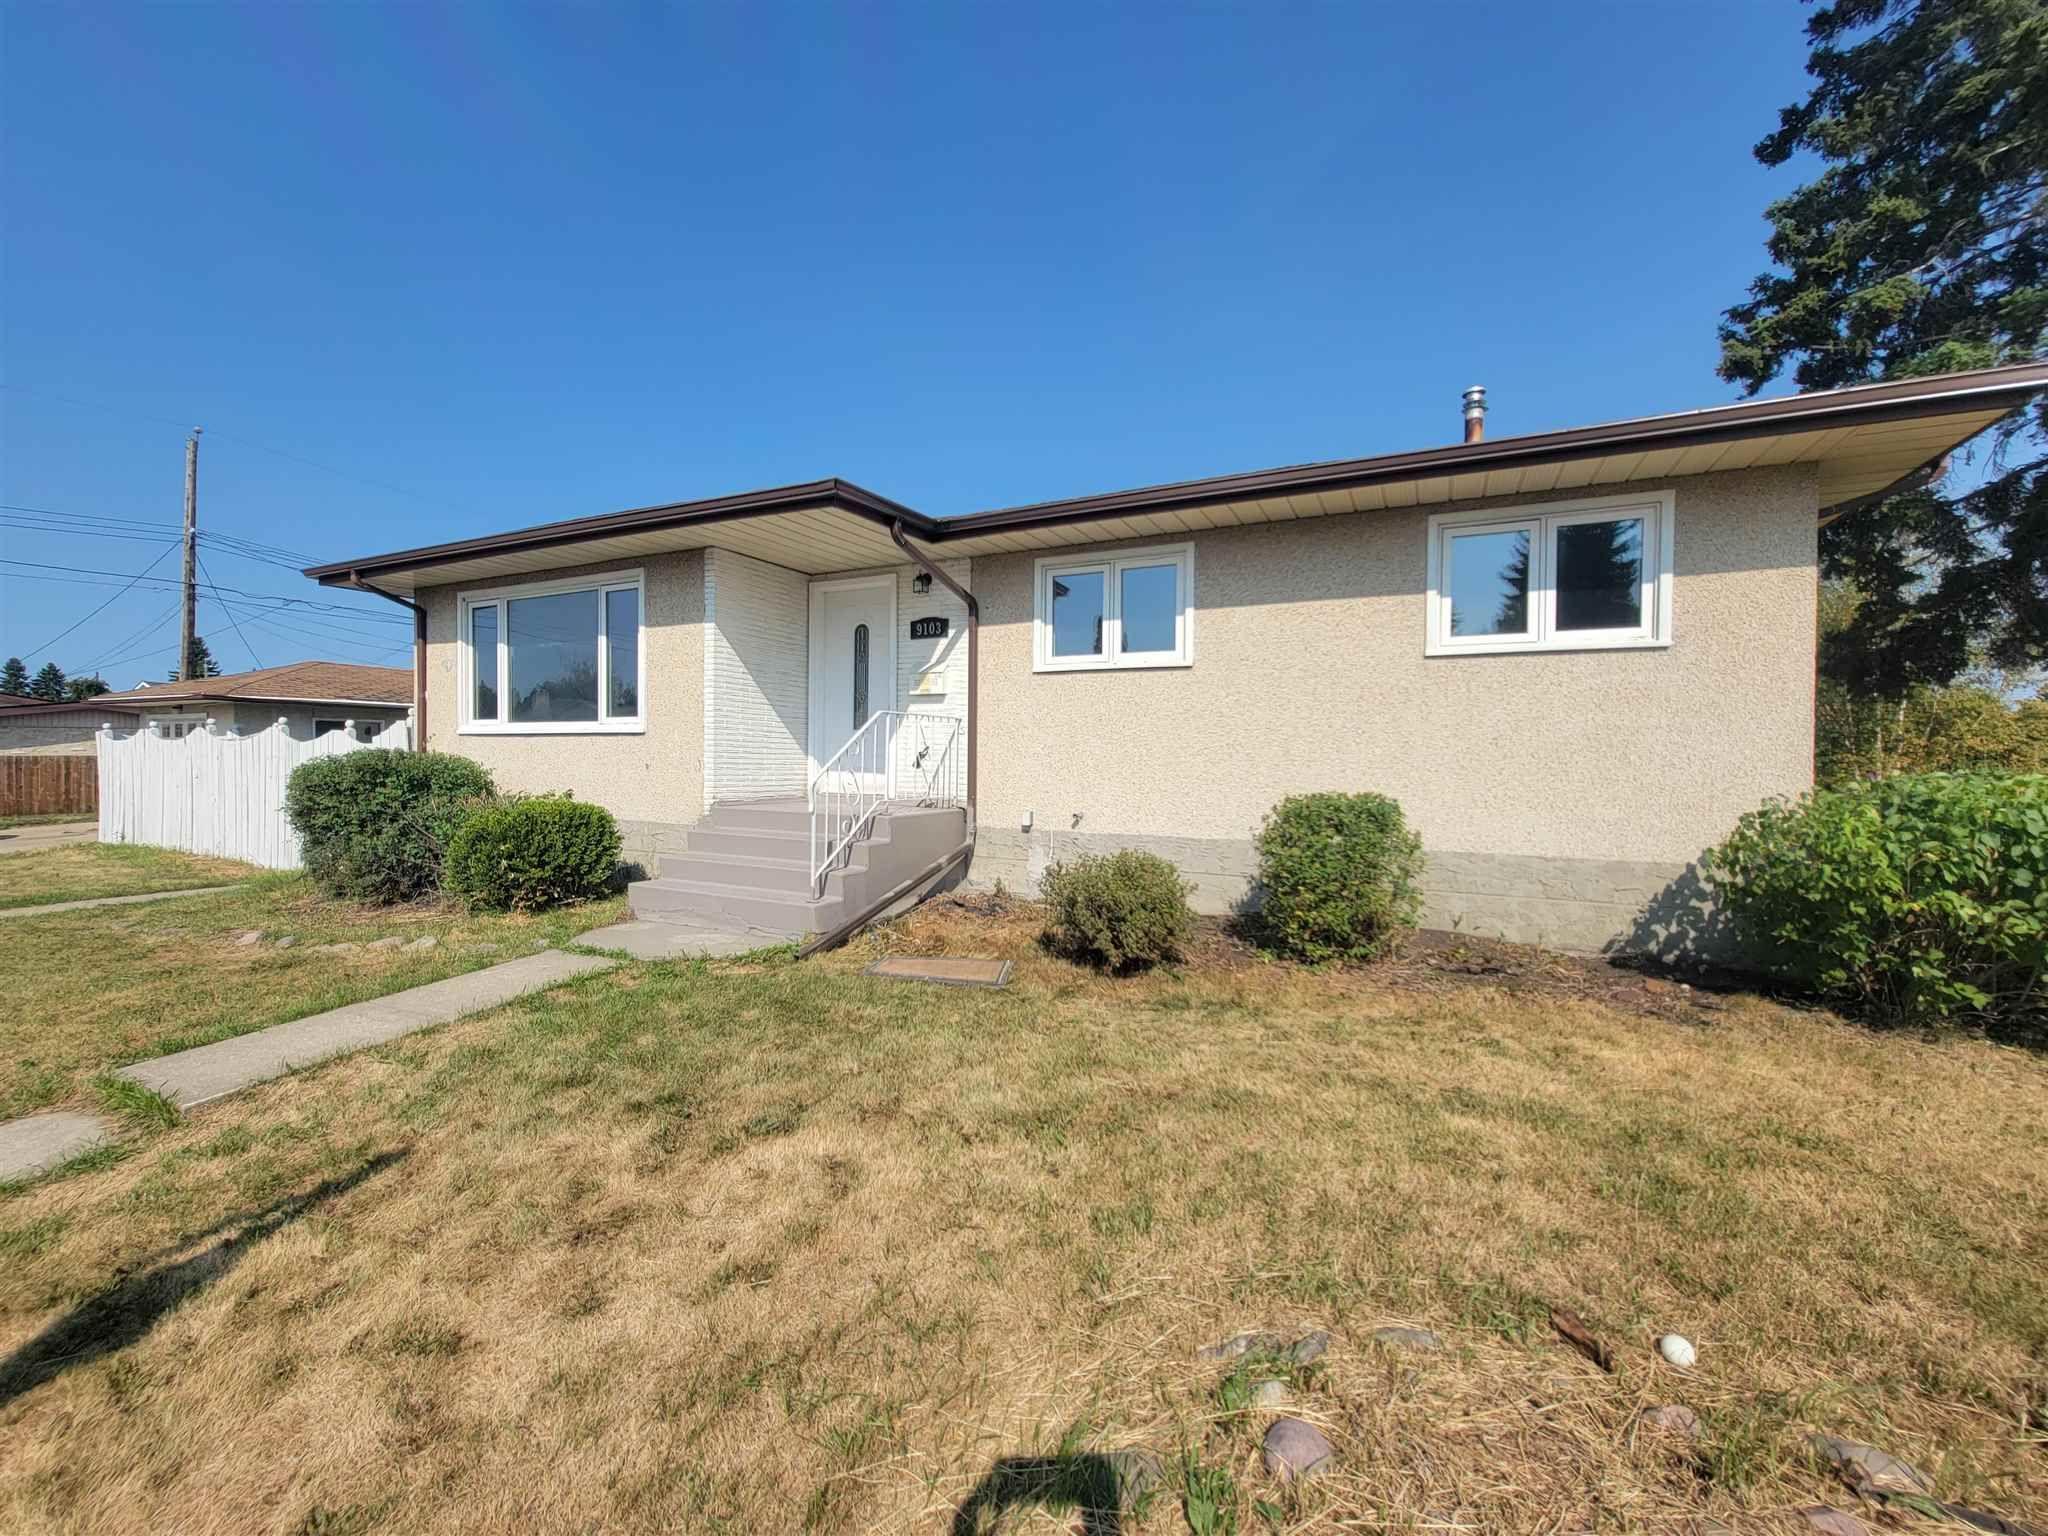 Main Photo: 9103 58 Street in Edmonton: Zone 18 House for sale : MLS®# E4239916